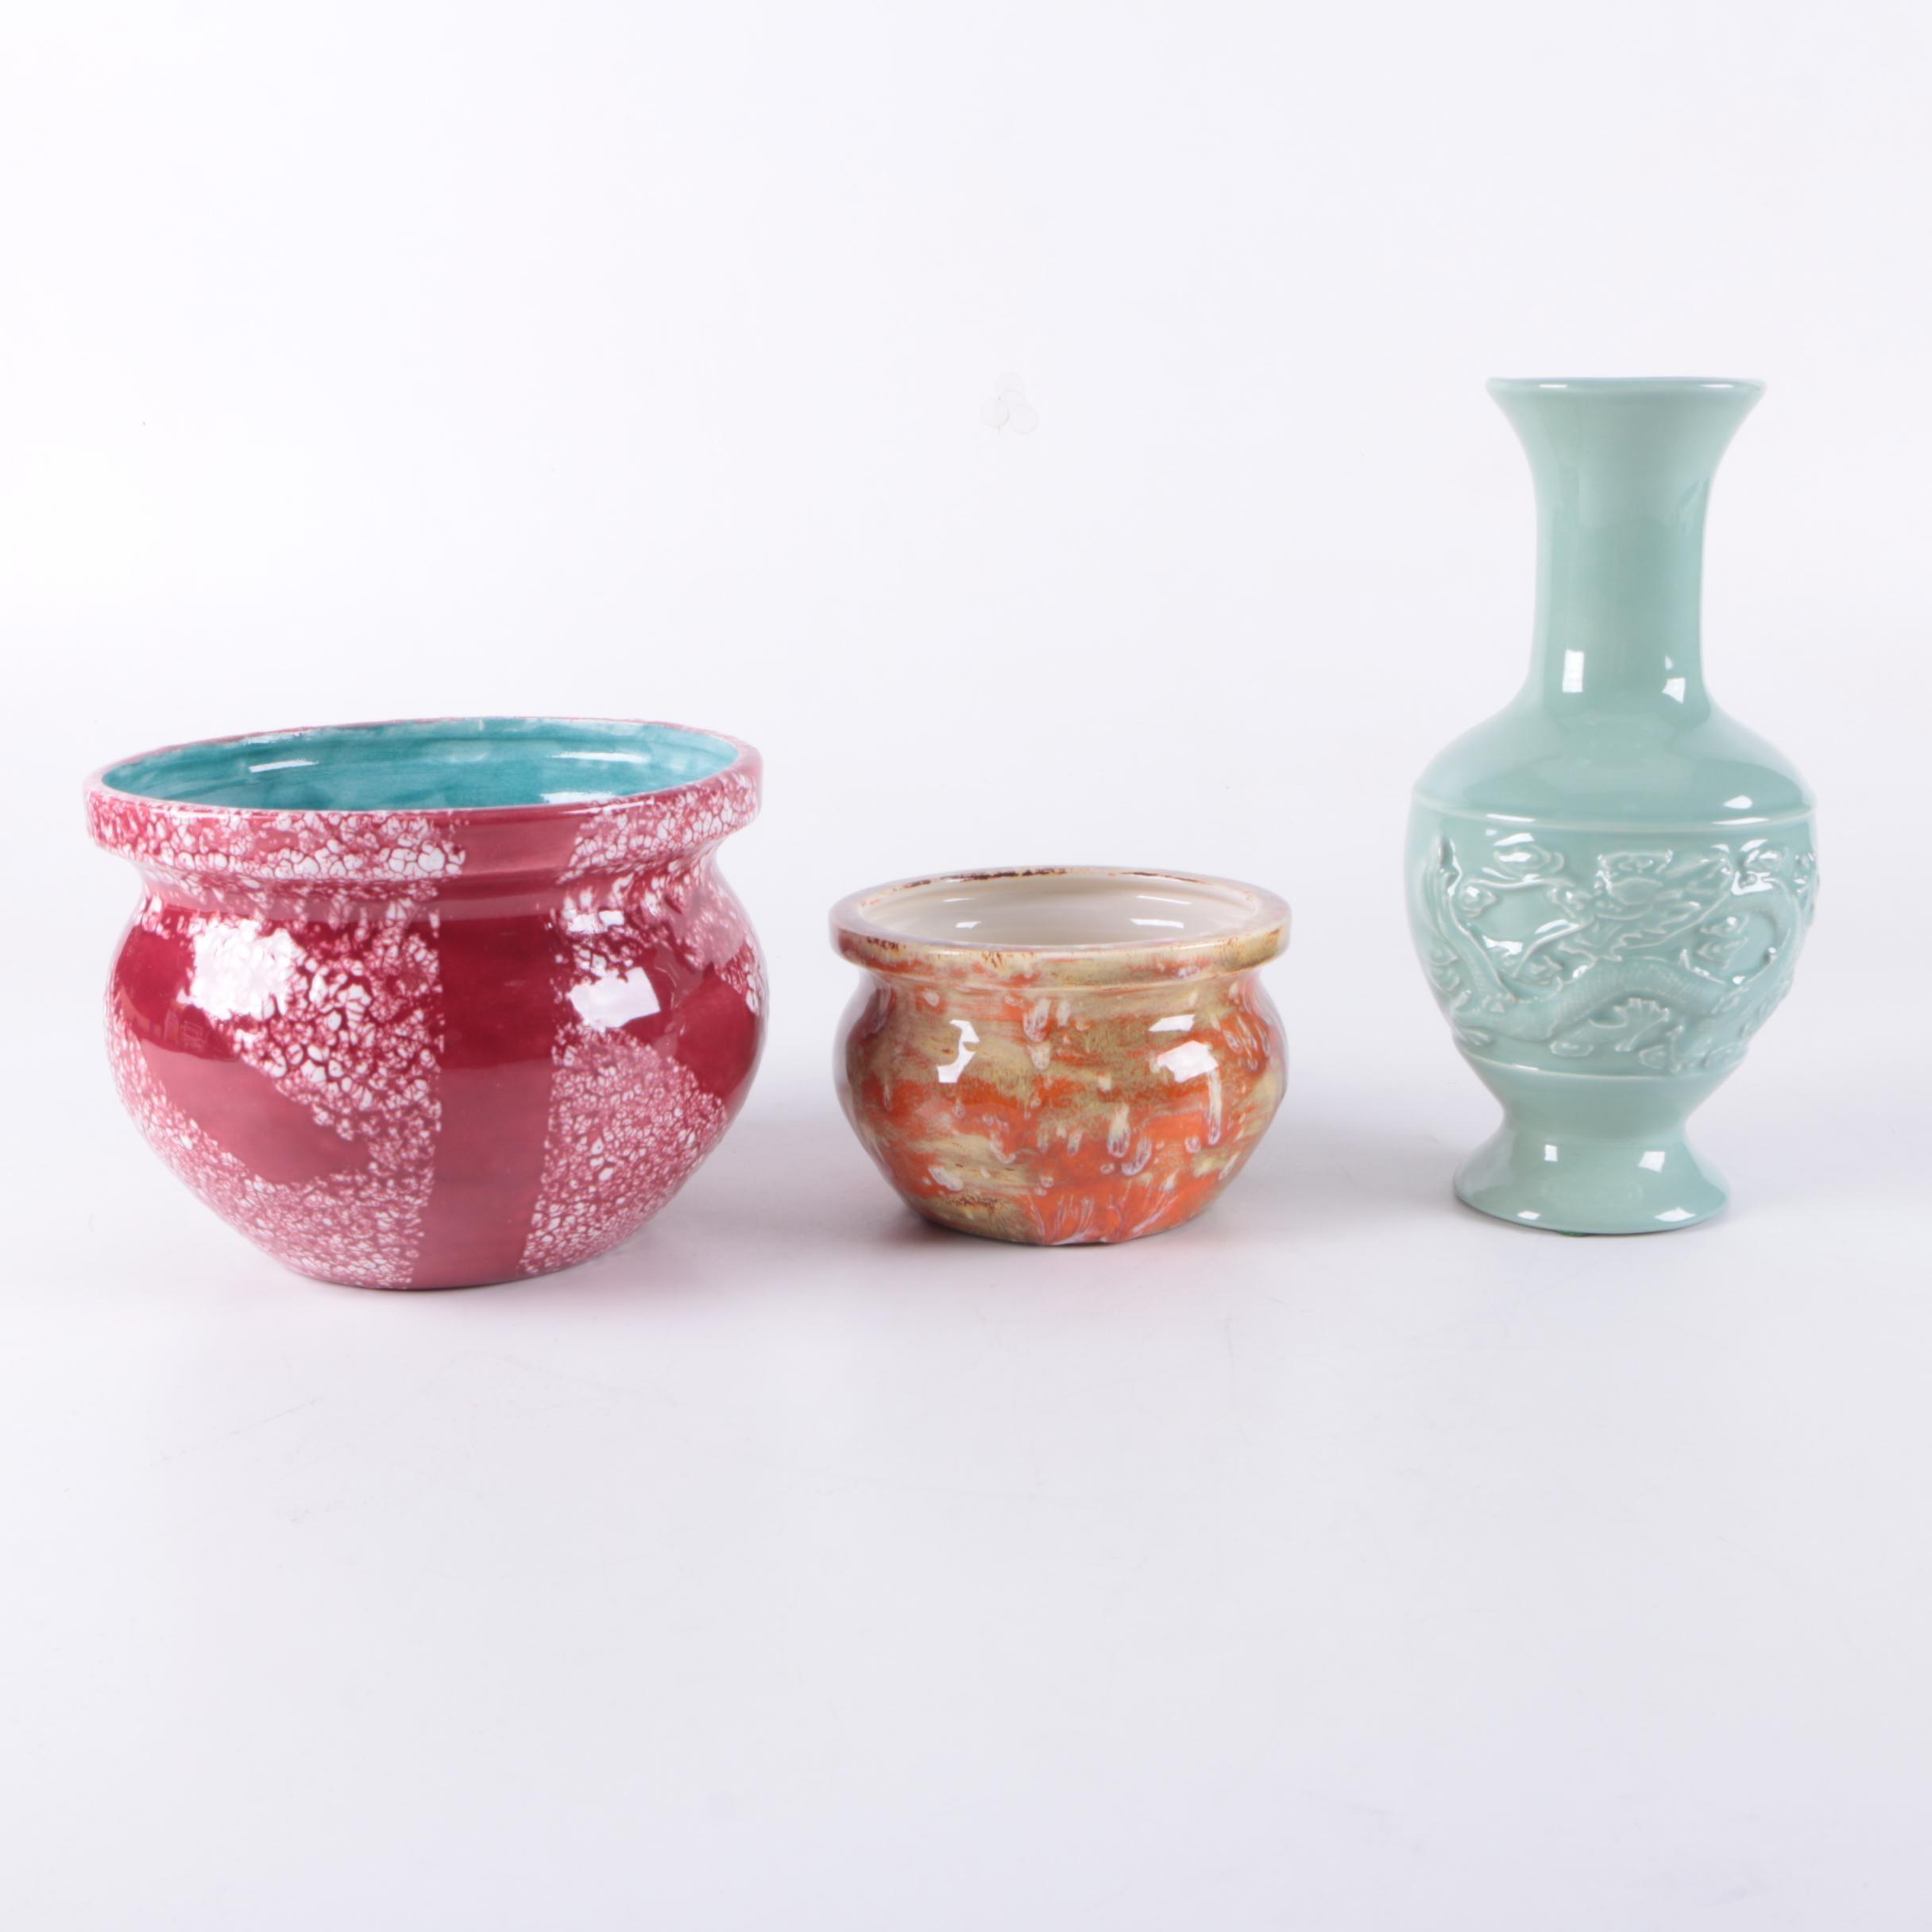 Ellen George Ceramic Bowls and Vase